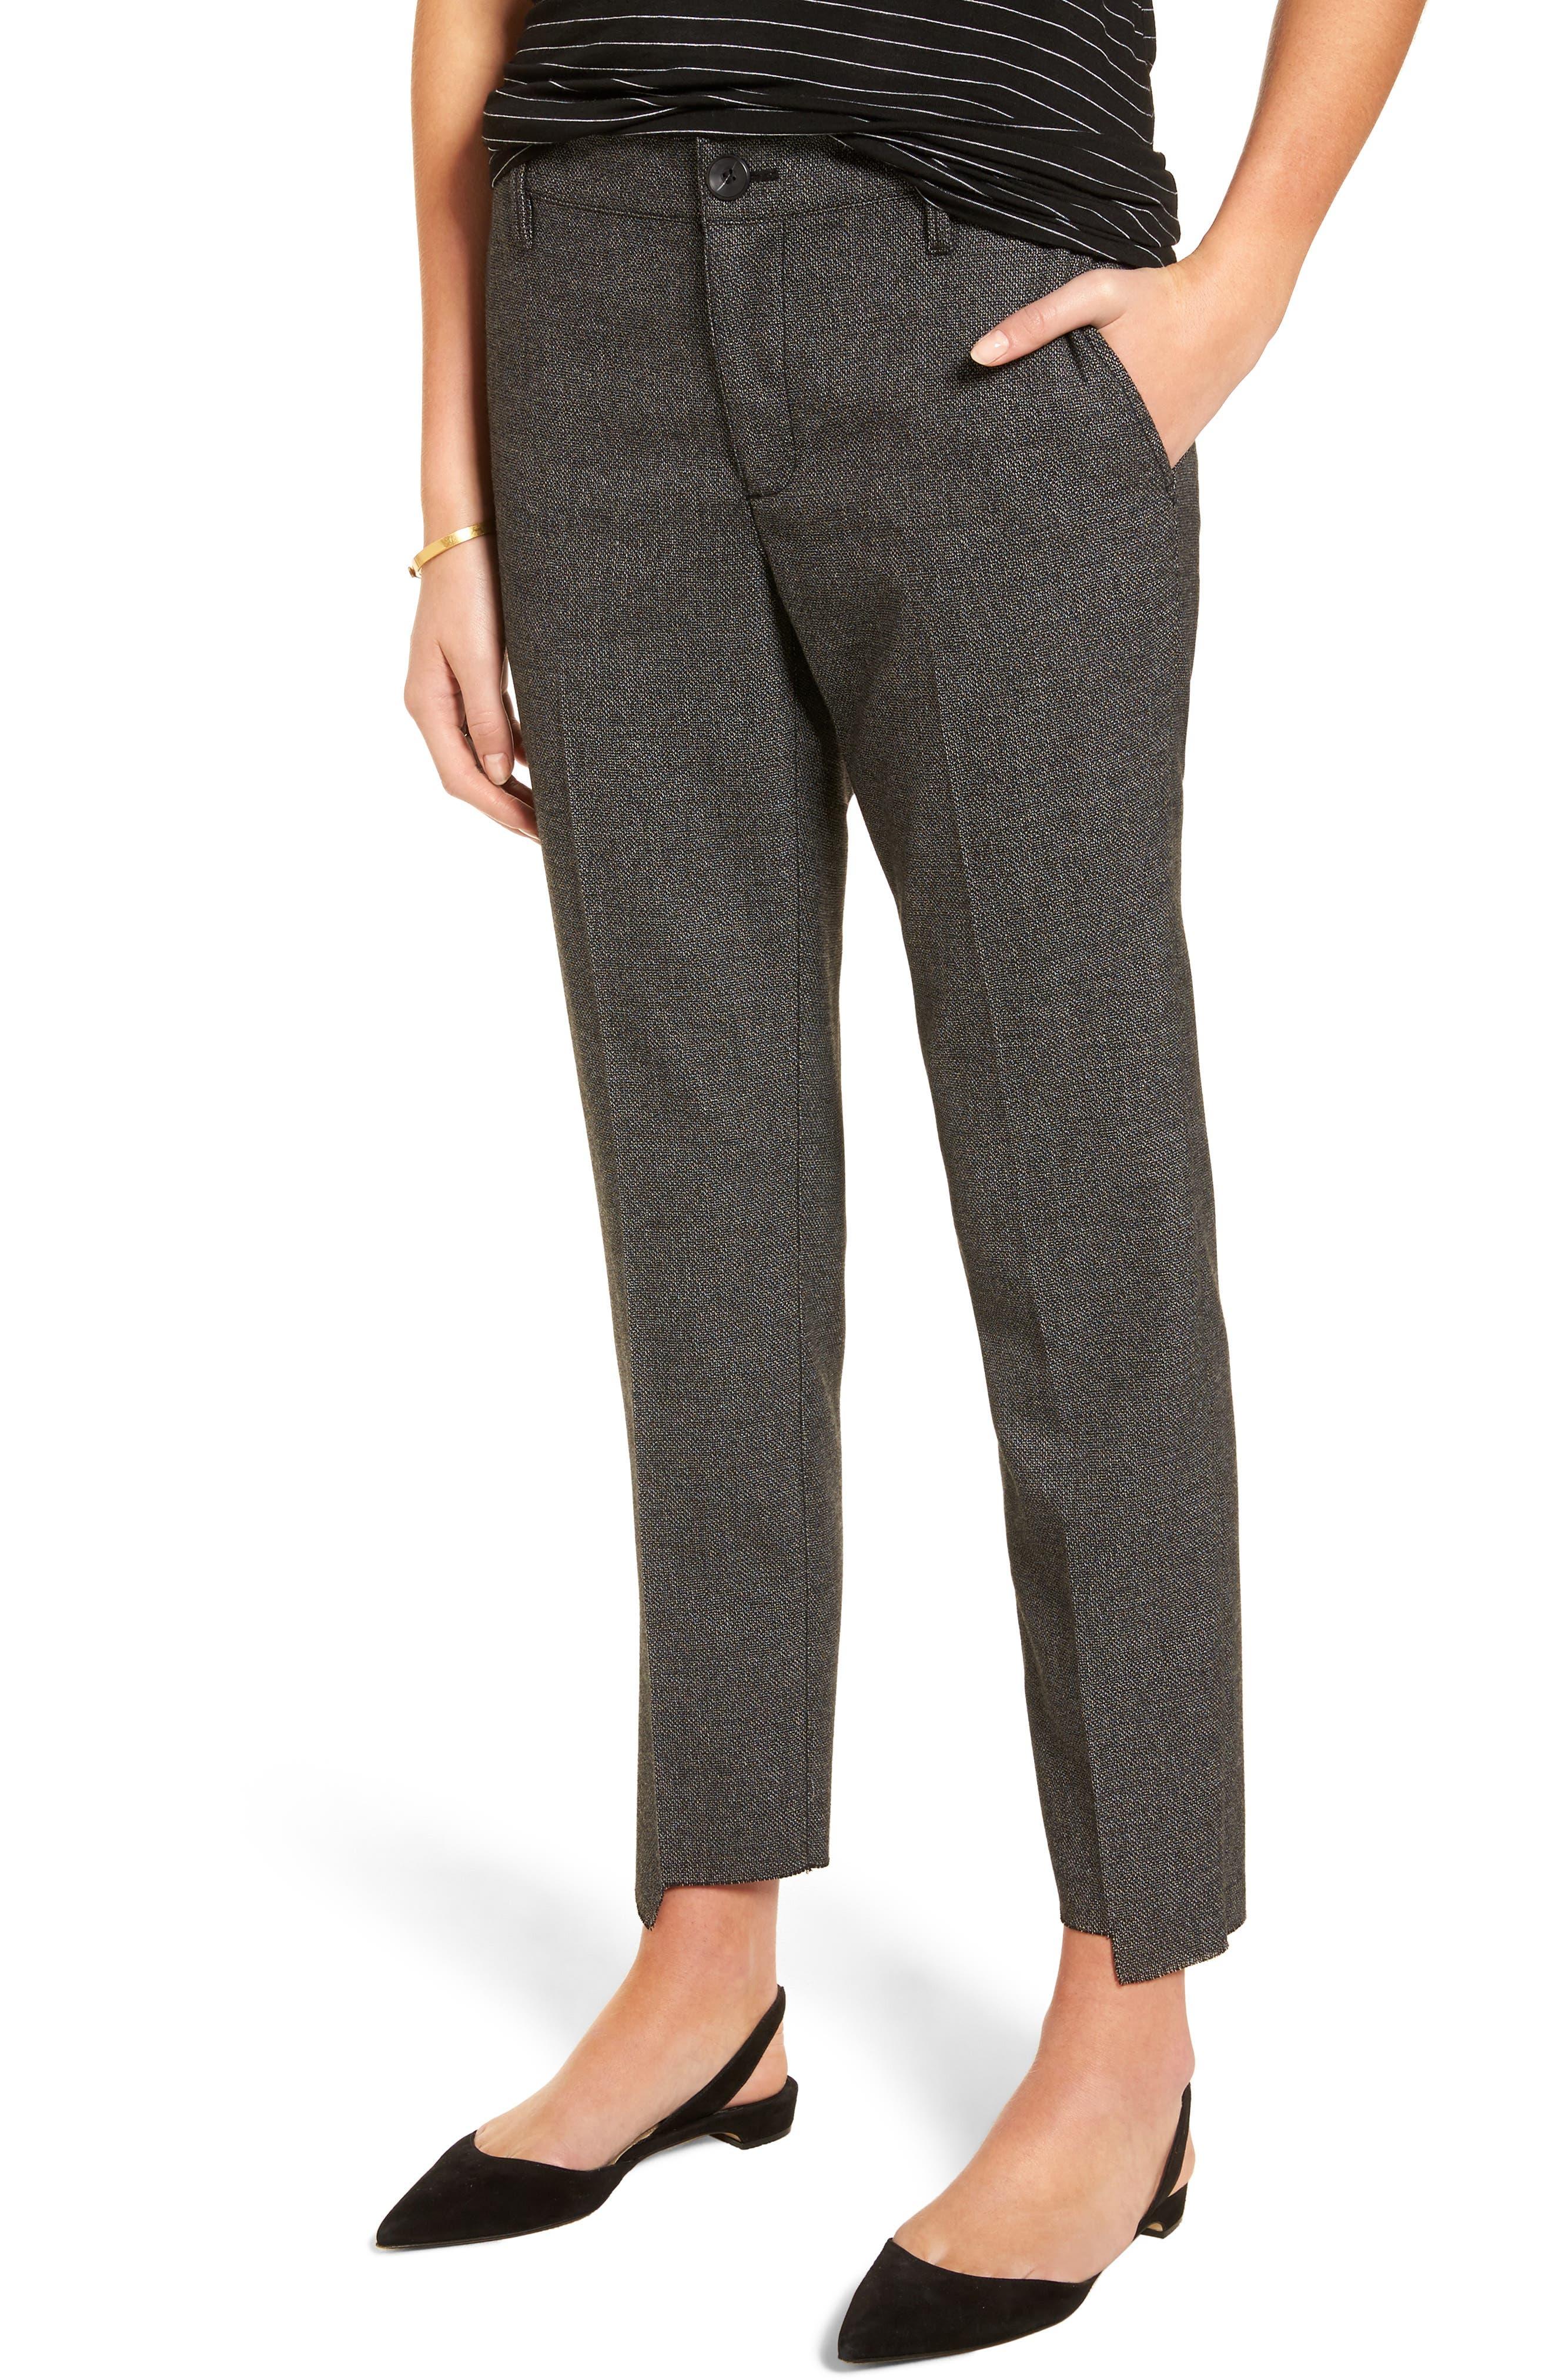 Tresure & Bond Crop Menswear Pants